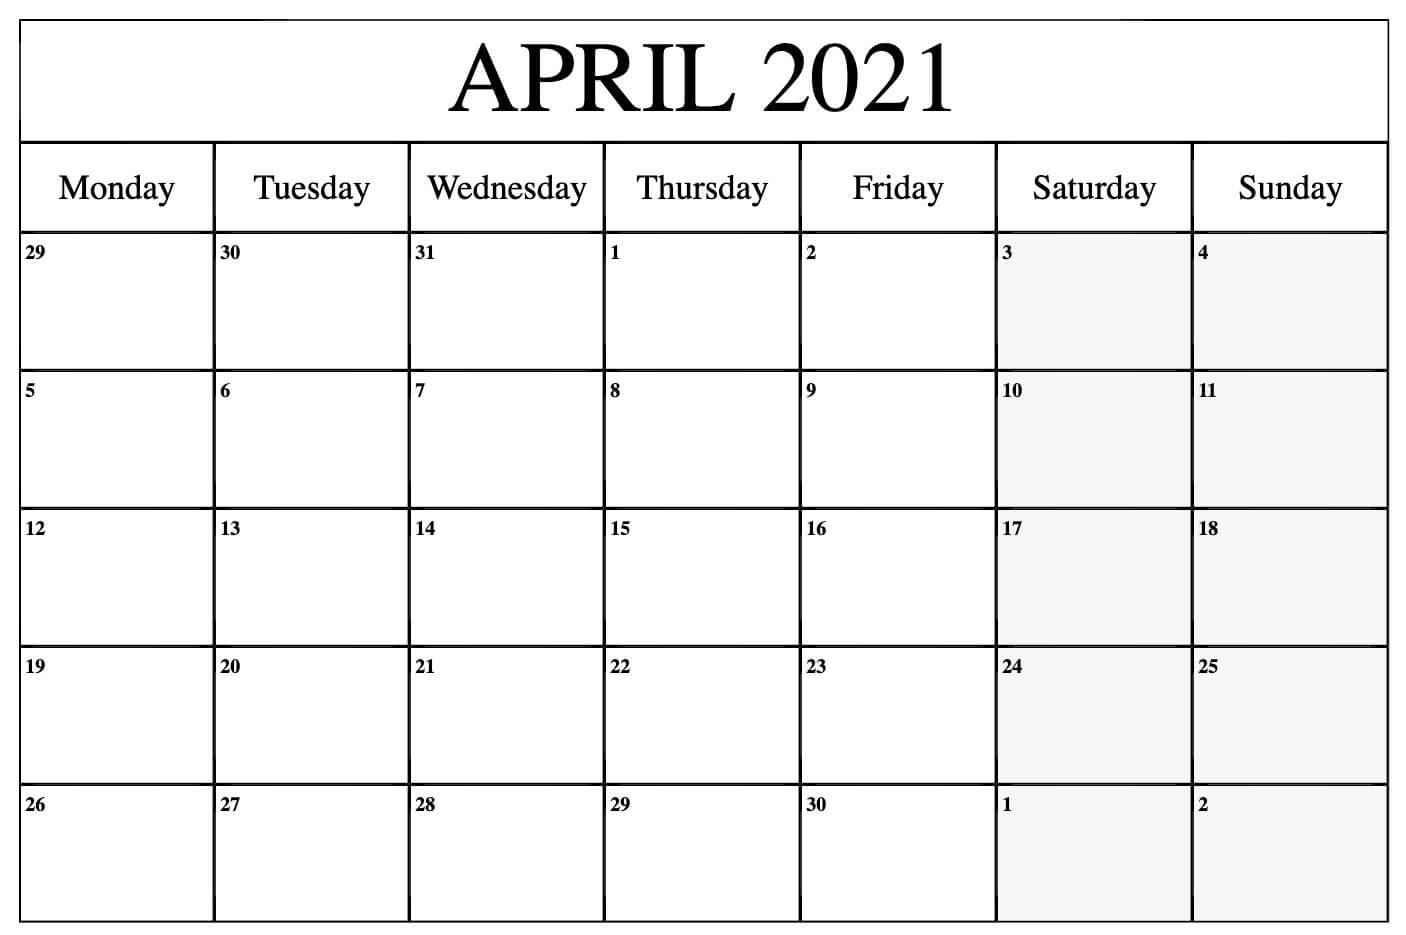 April 2021 Blank Calendar Template